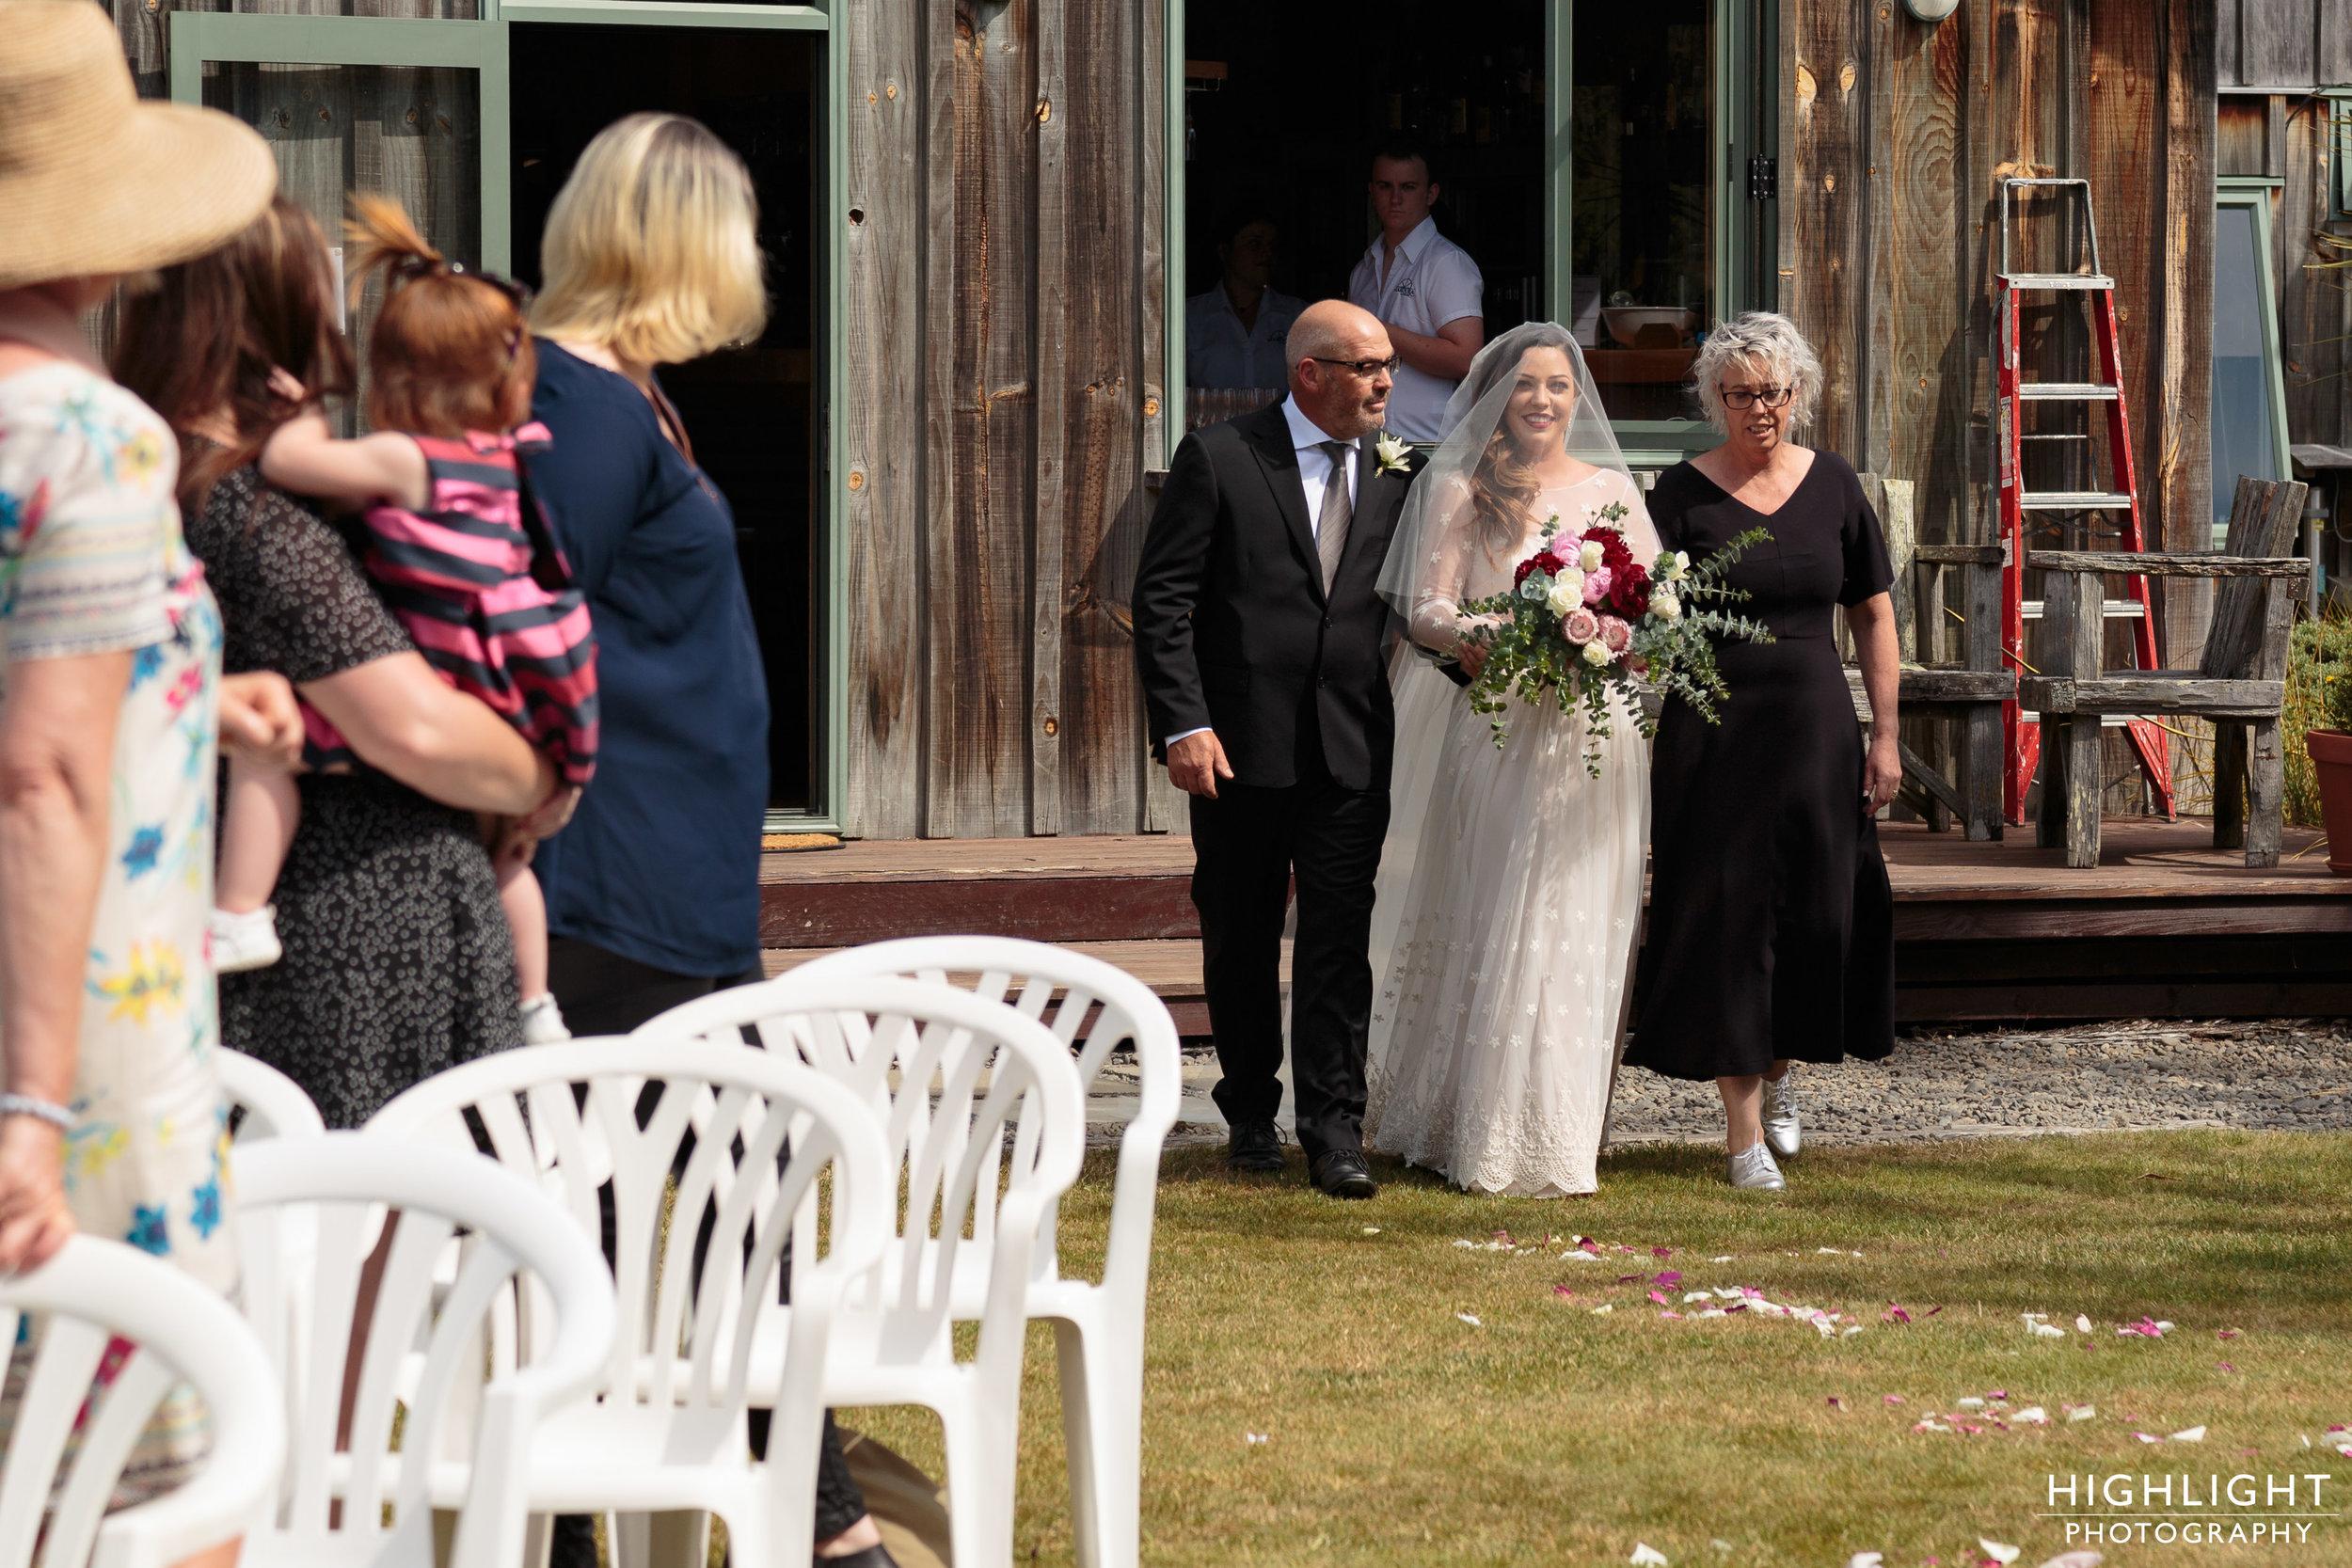 highlight-wedding-photography-new-zealand-makoura-lodge-wedding-56.jpg